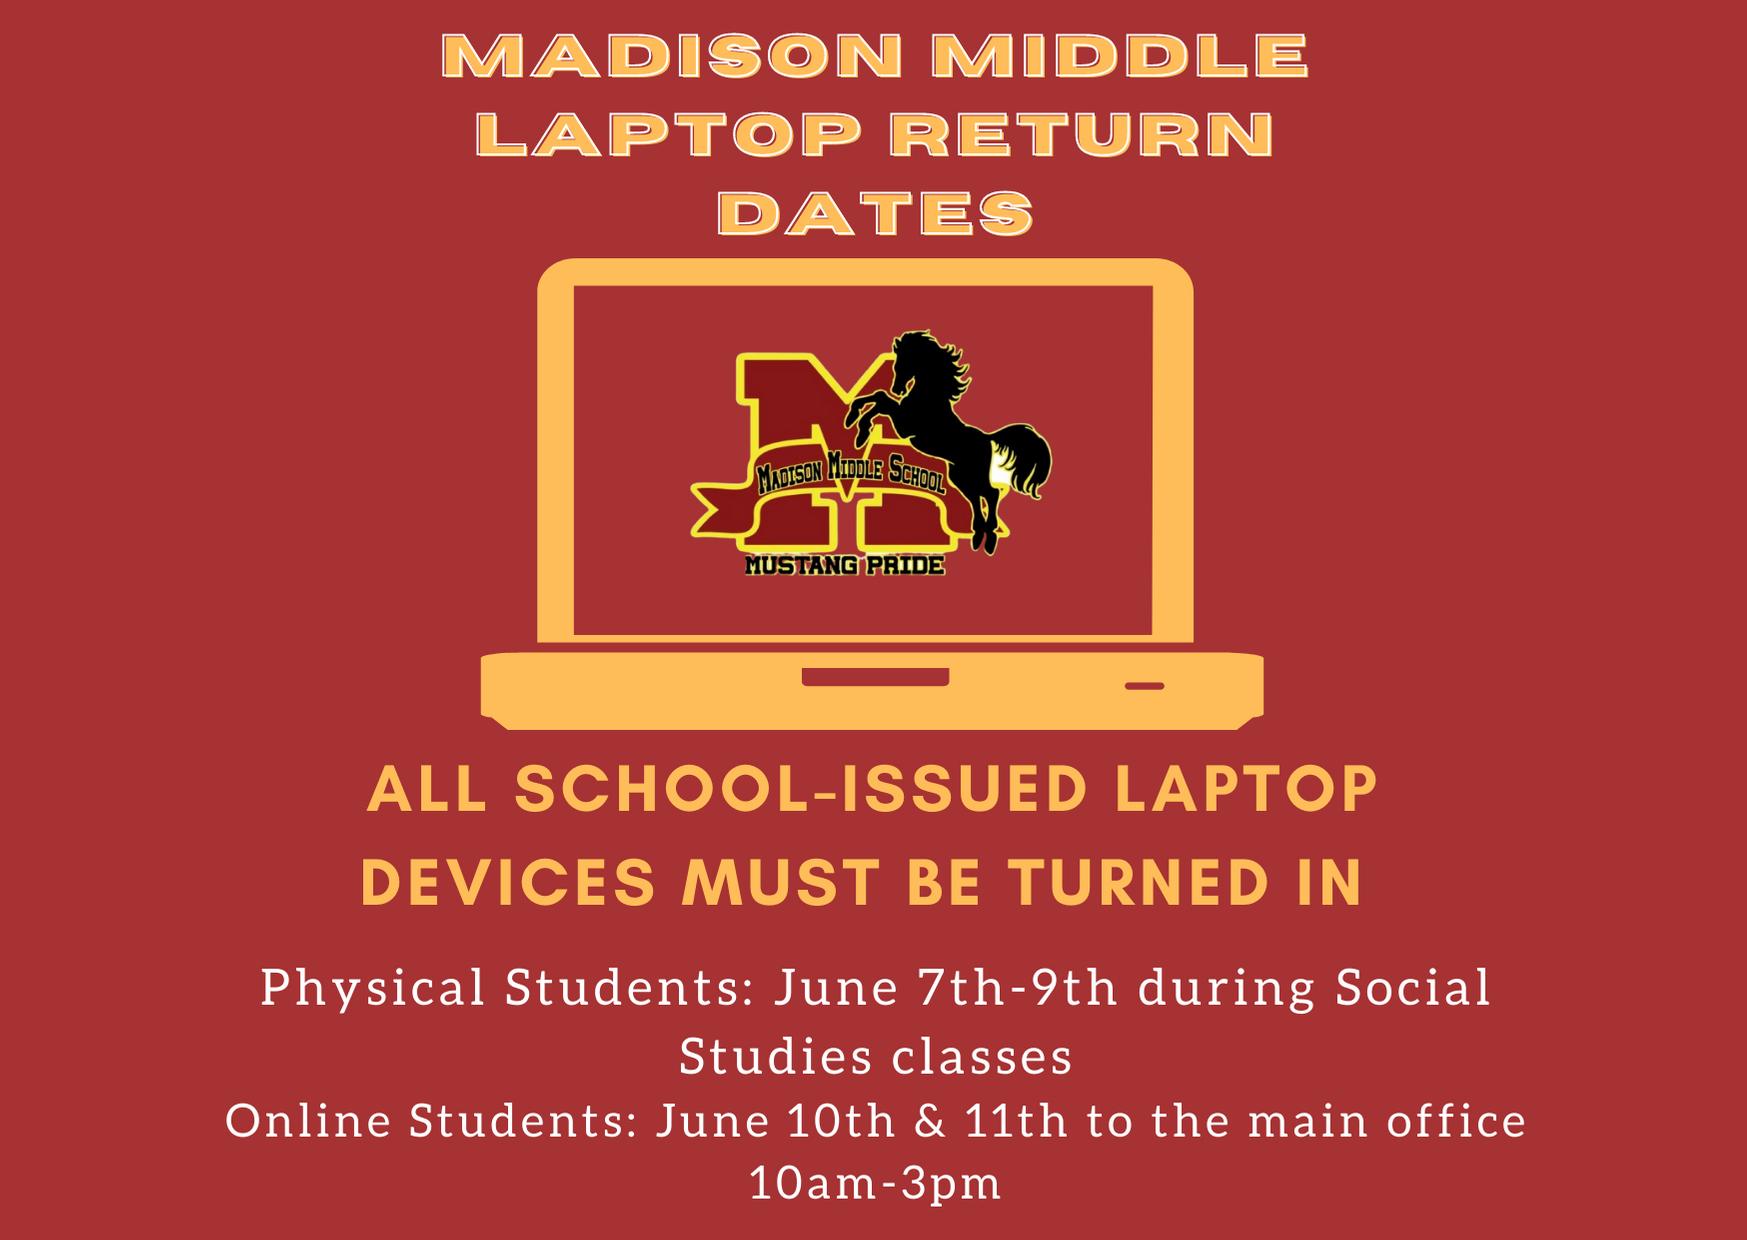 Laptop return dates flyer